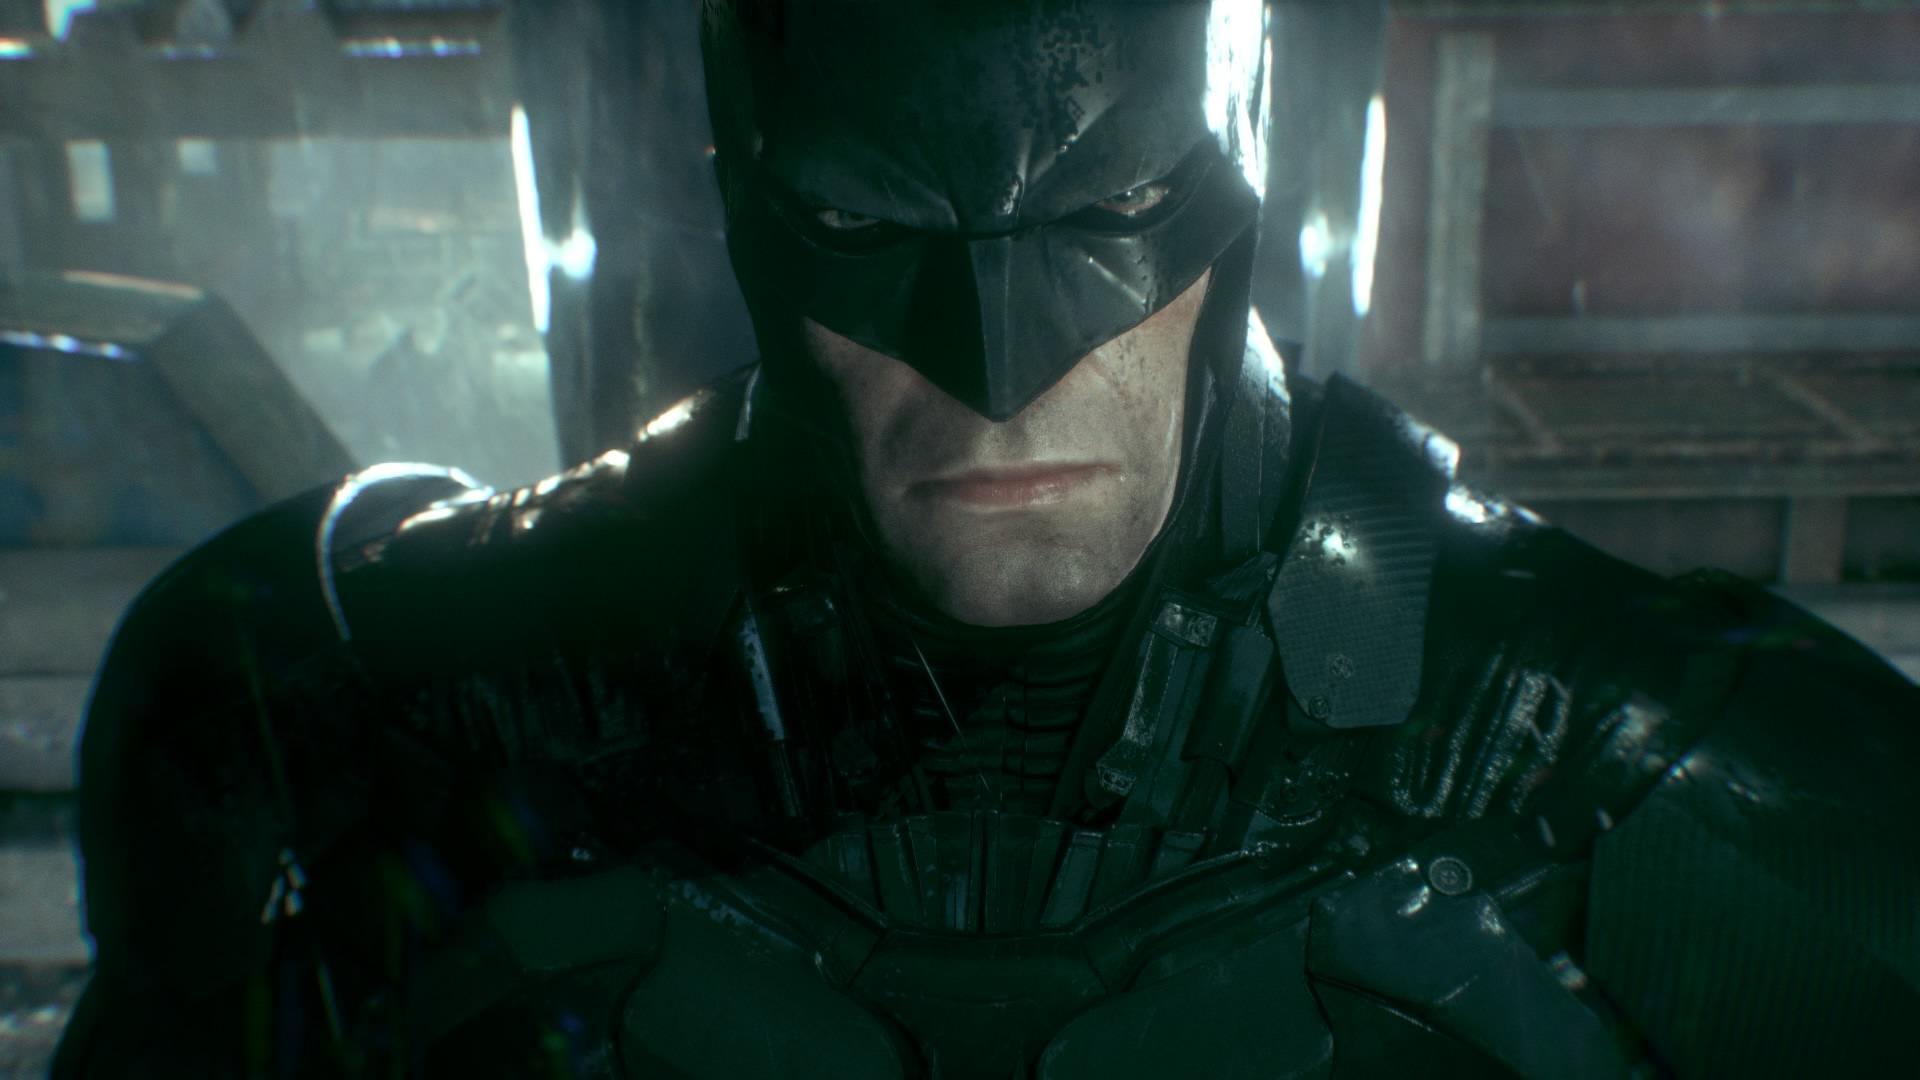 Recenze: Batman Arkham Knight – Strach nad Gothamem 10710